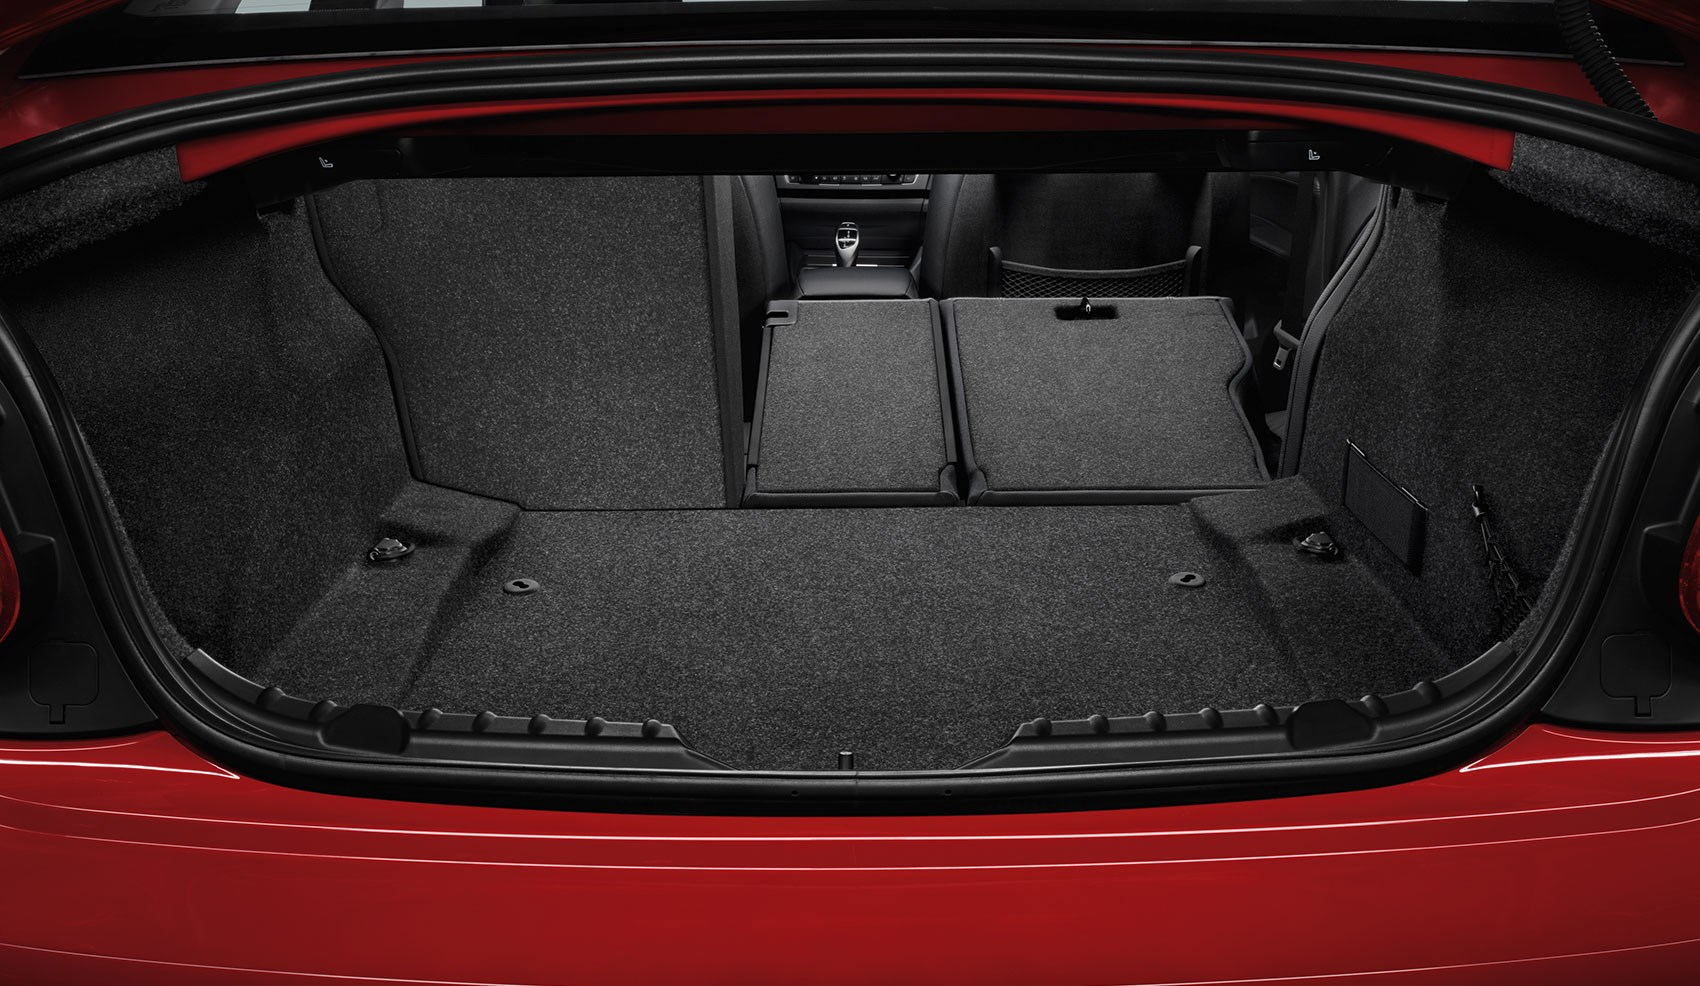 0 Down Lease Deals >> BMW 220d M Sport Coupe (2016) review by CAR Magazine